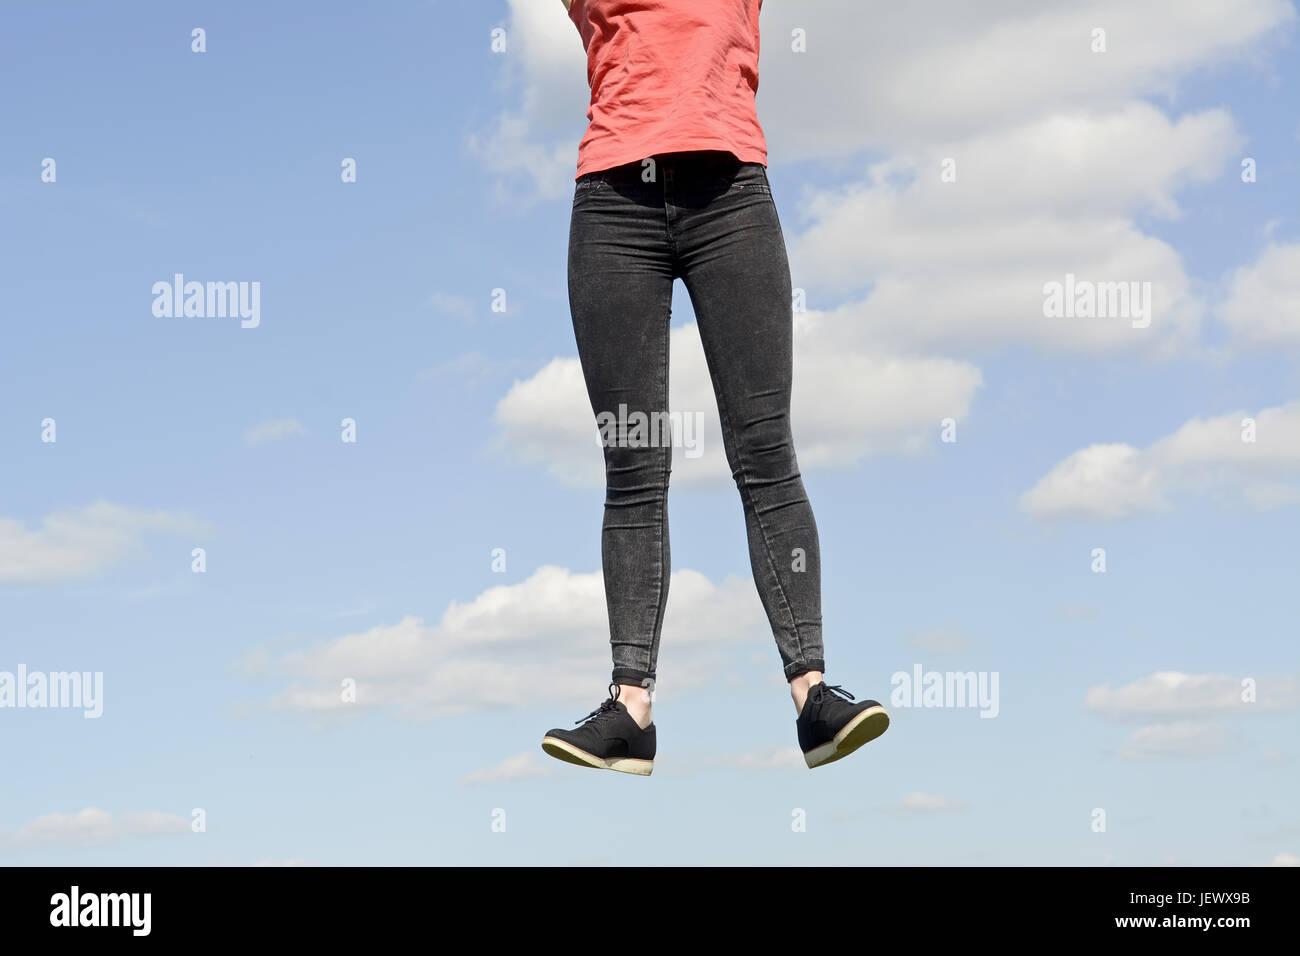 joyful young woman leaping - Stock Image